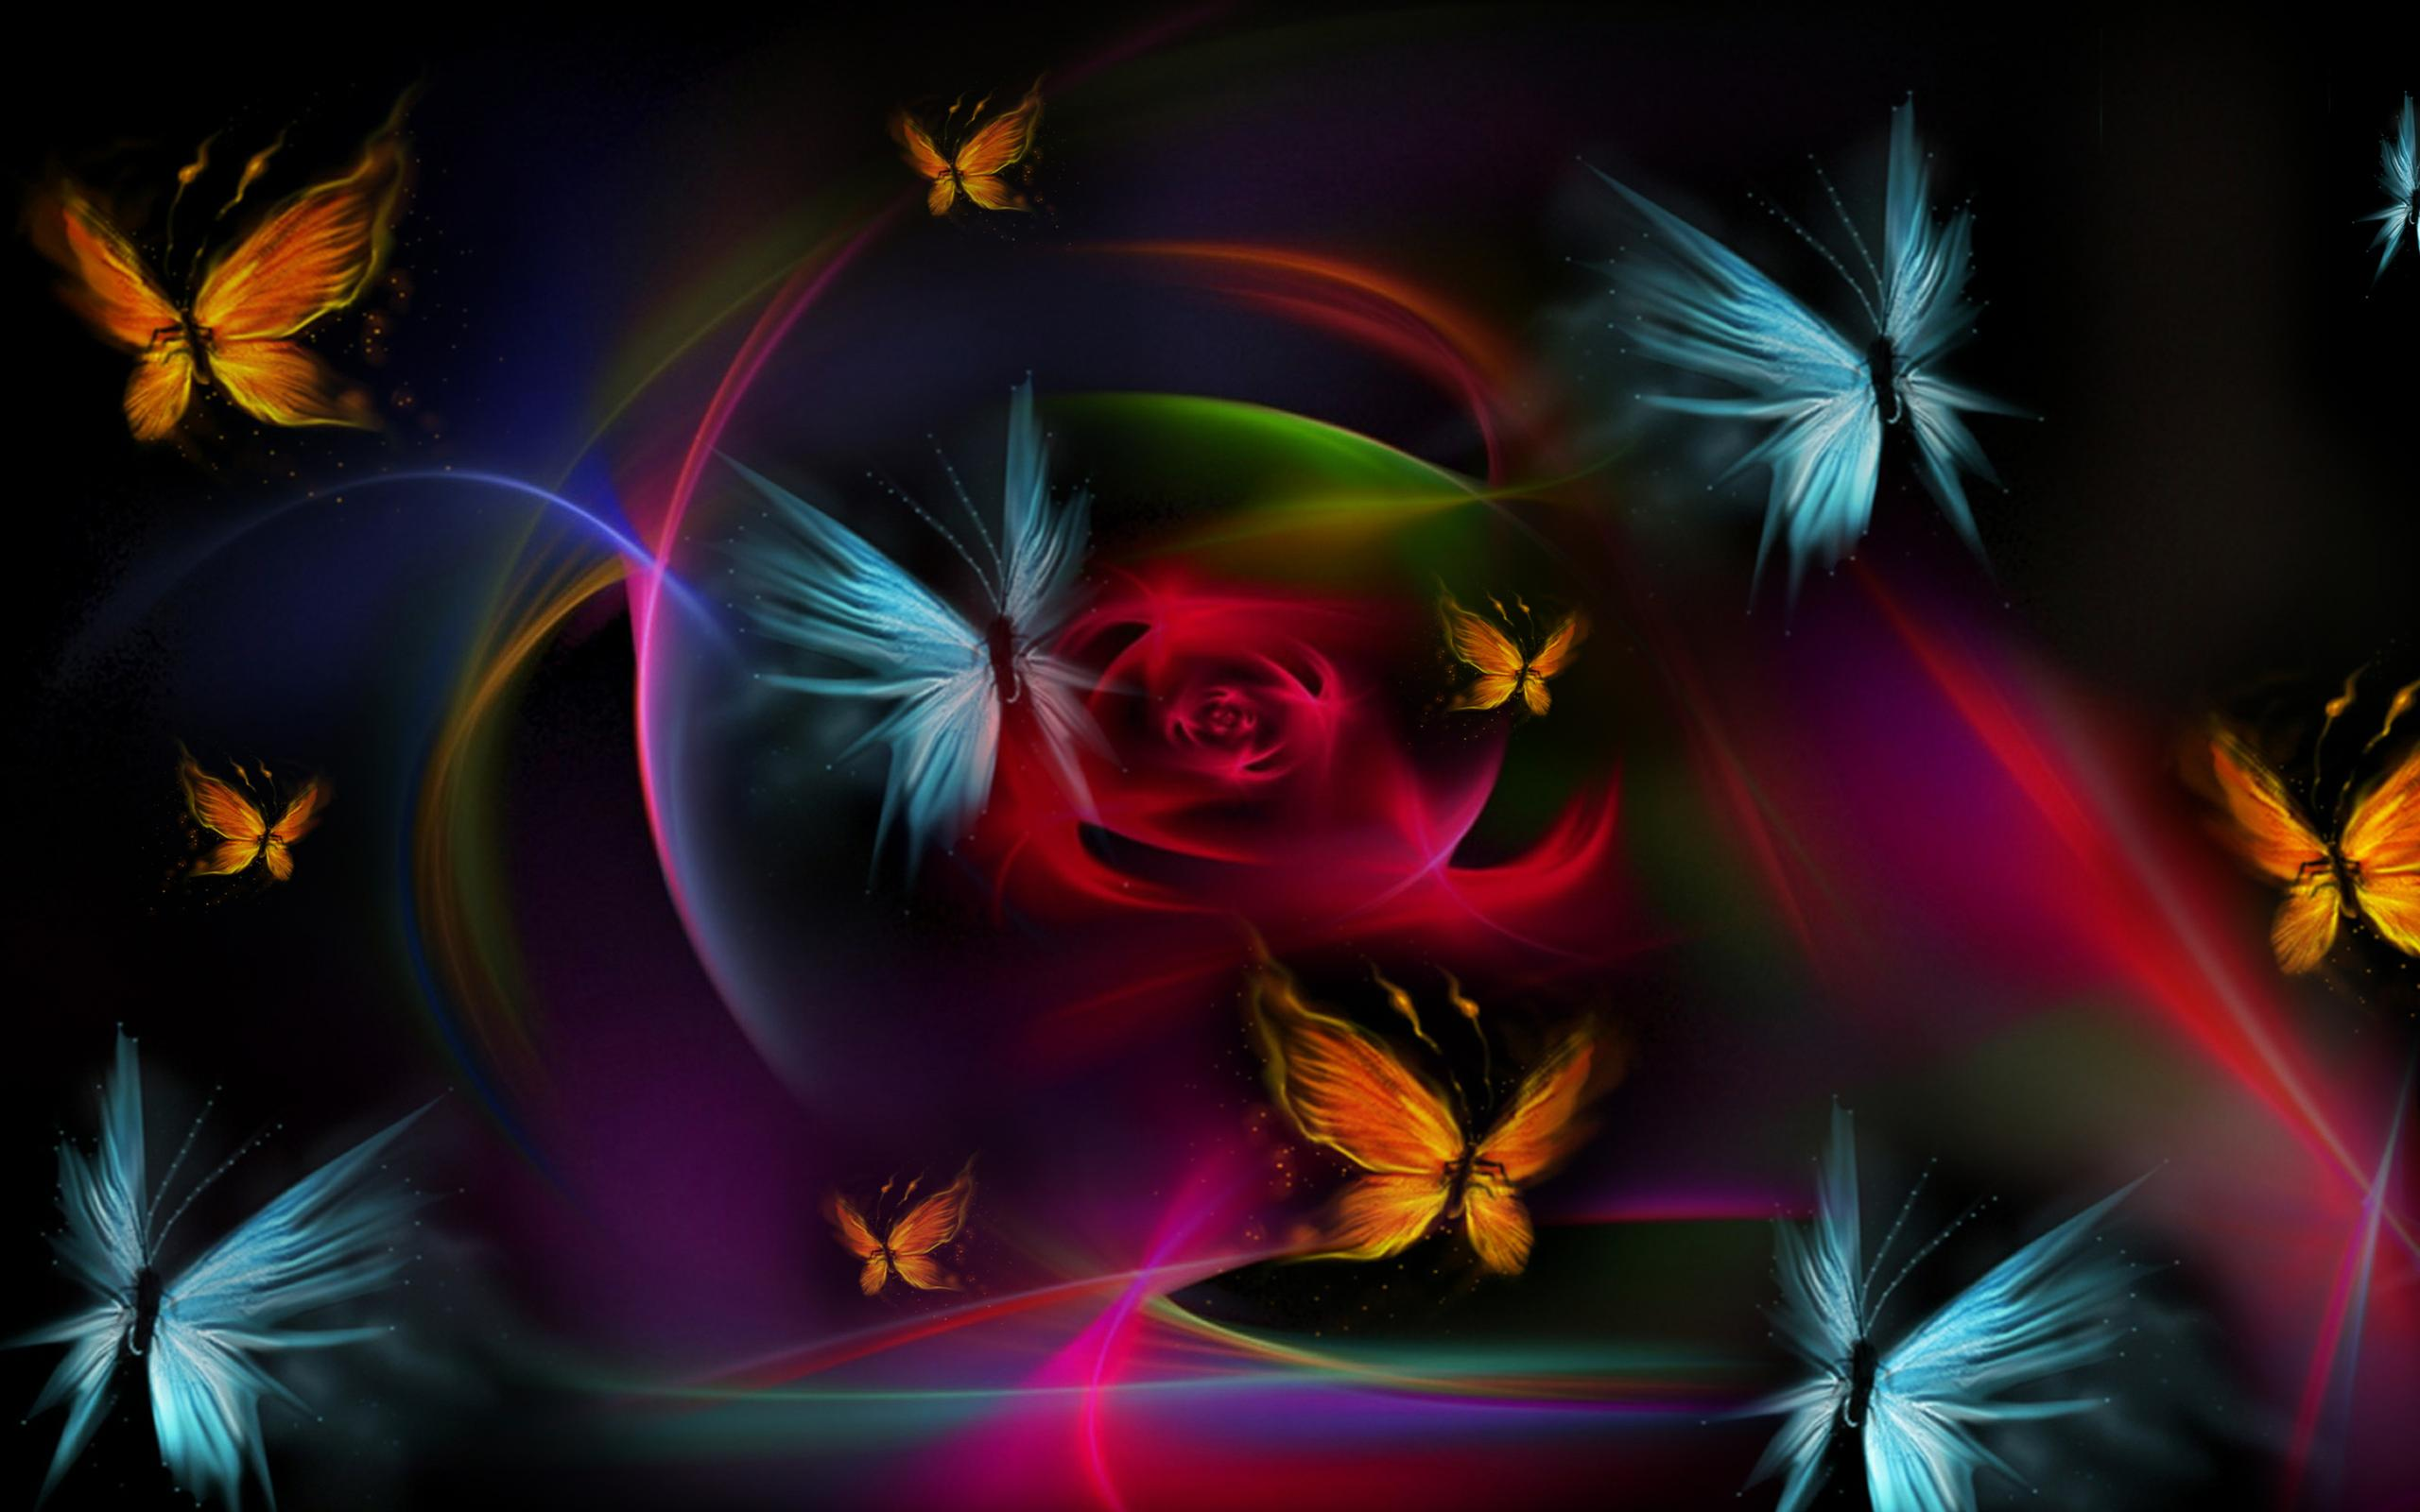 3d Butterfly Wallpaper Images crazygalleryinfo   Leechh Link Site 2560x1600